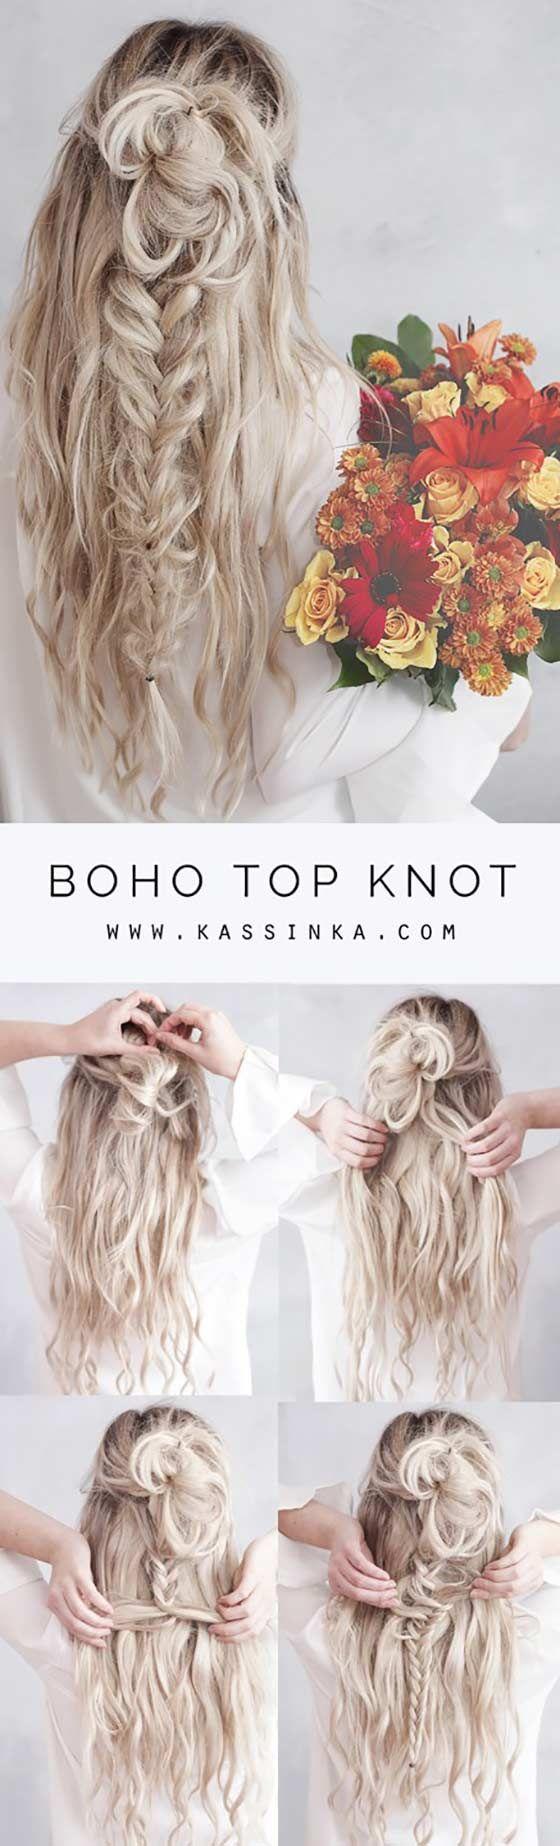 braided hairstyles for long hair braidedhairstylesboho braided